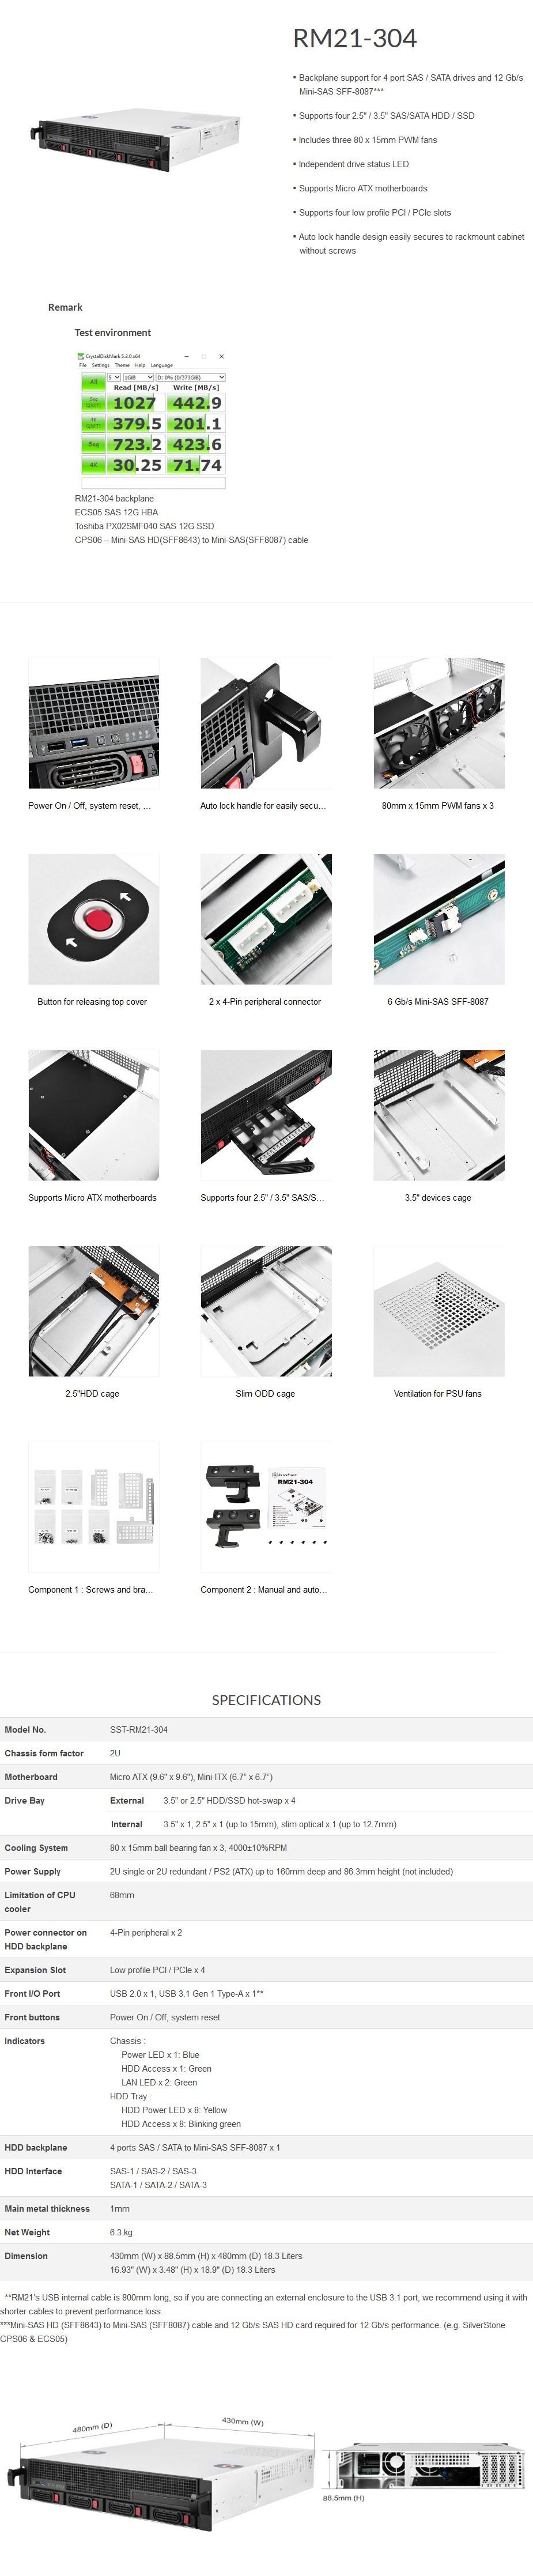 silverstone-rm21304-2u-rackmount-case-black-ac40027-1.jpg